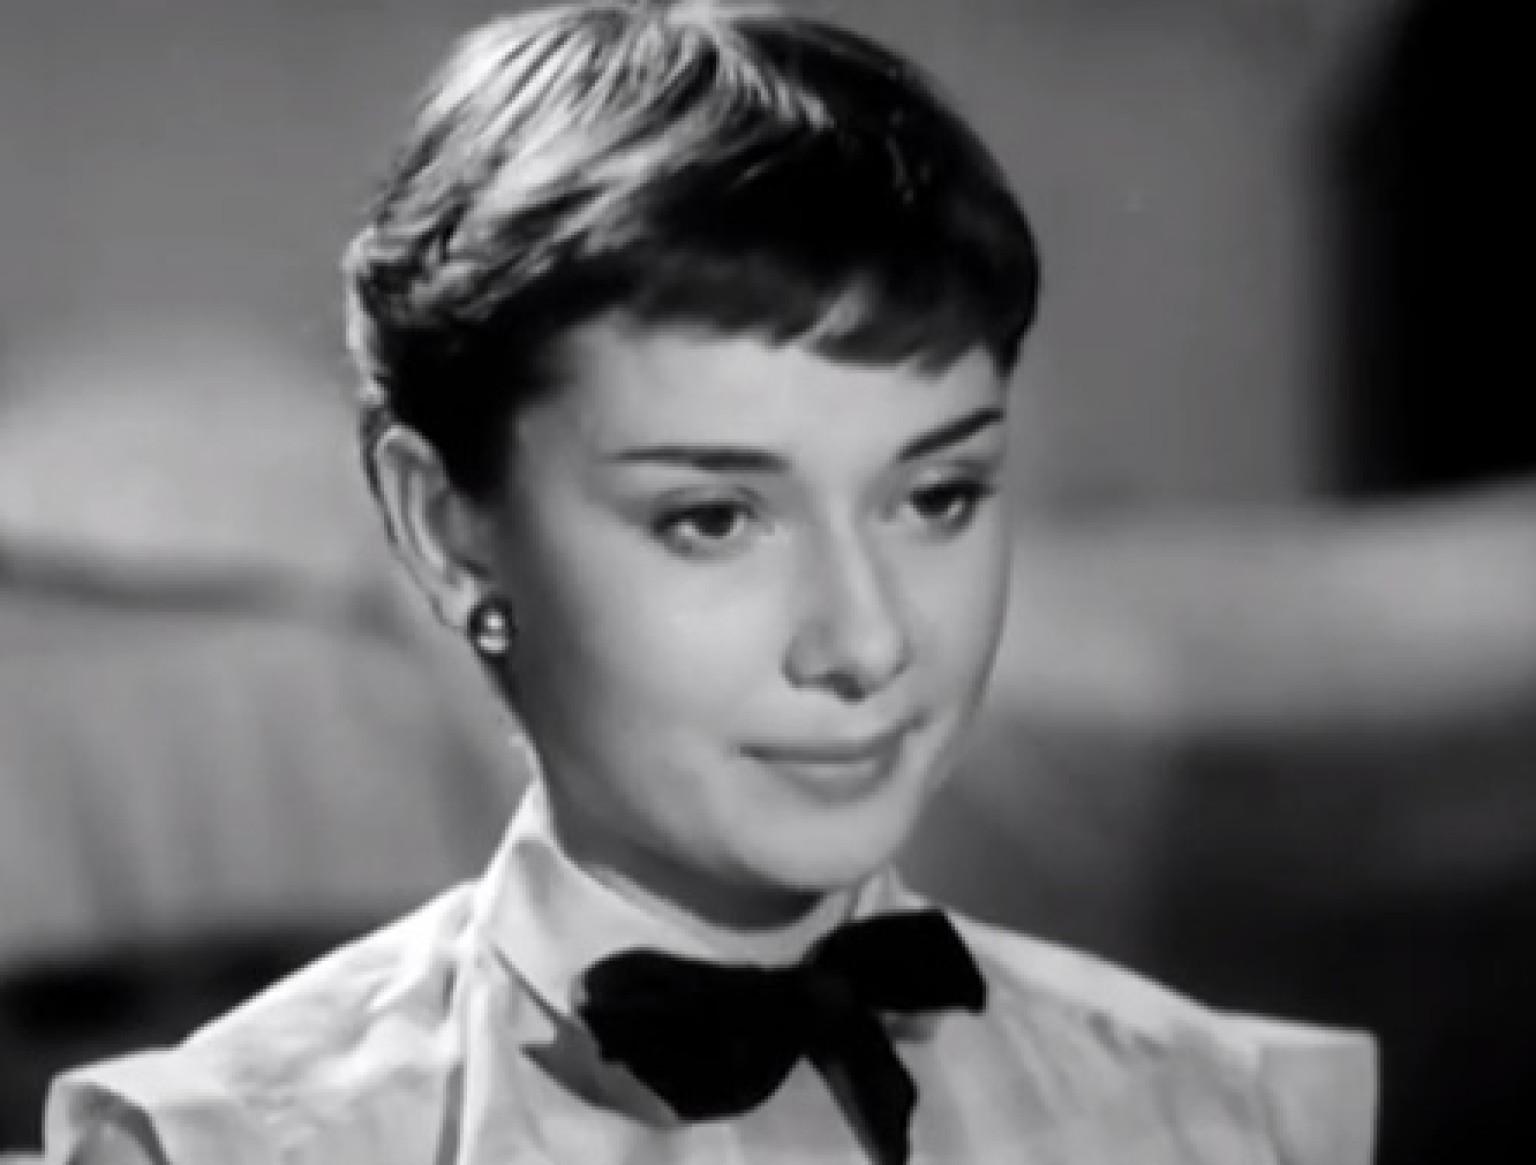 Audrey Hepburns Roman Holiday Audition Video Resurfaces